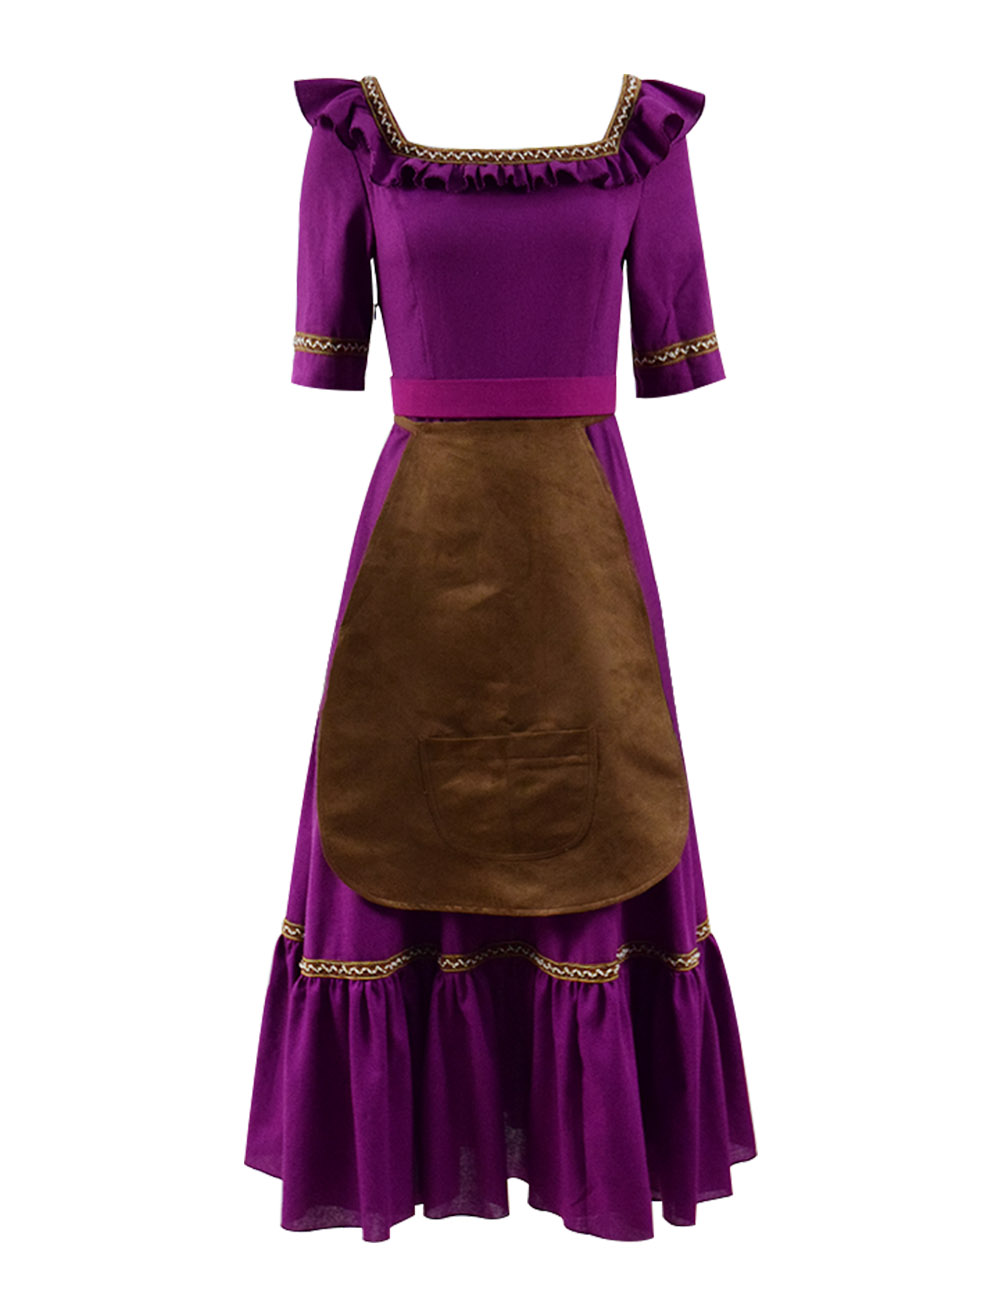 Cosdaddy Mamá Imelda Purple Dress Halloween Cosplay Costume For Women With Apron